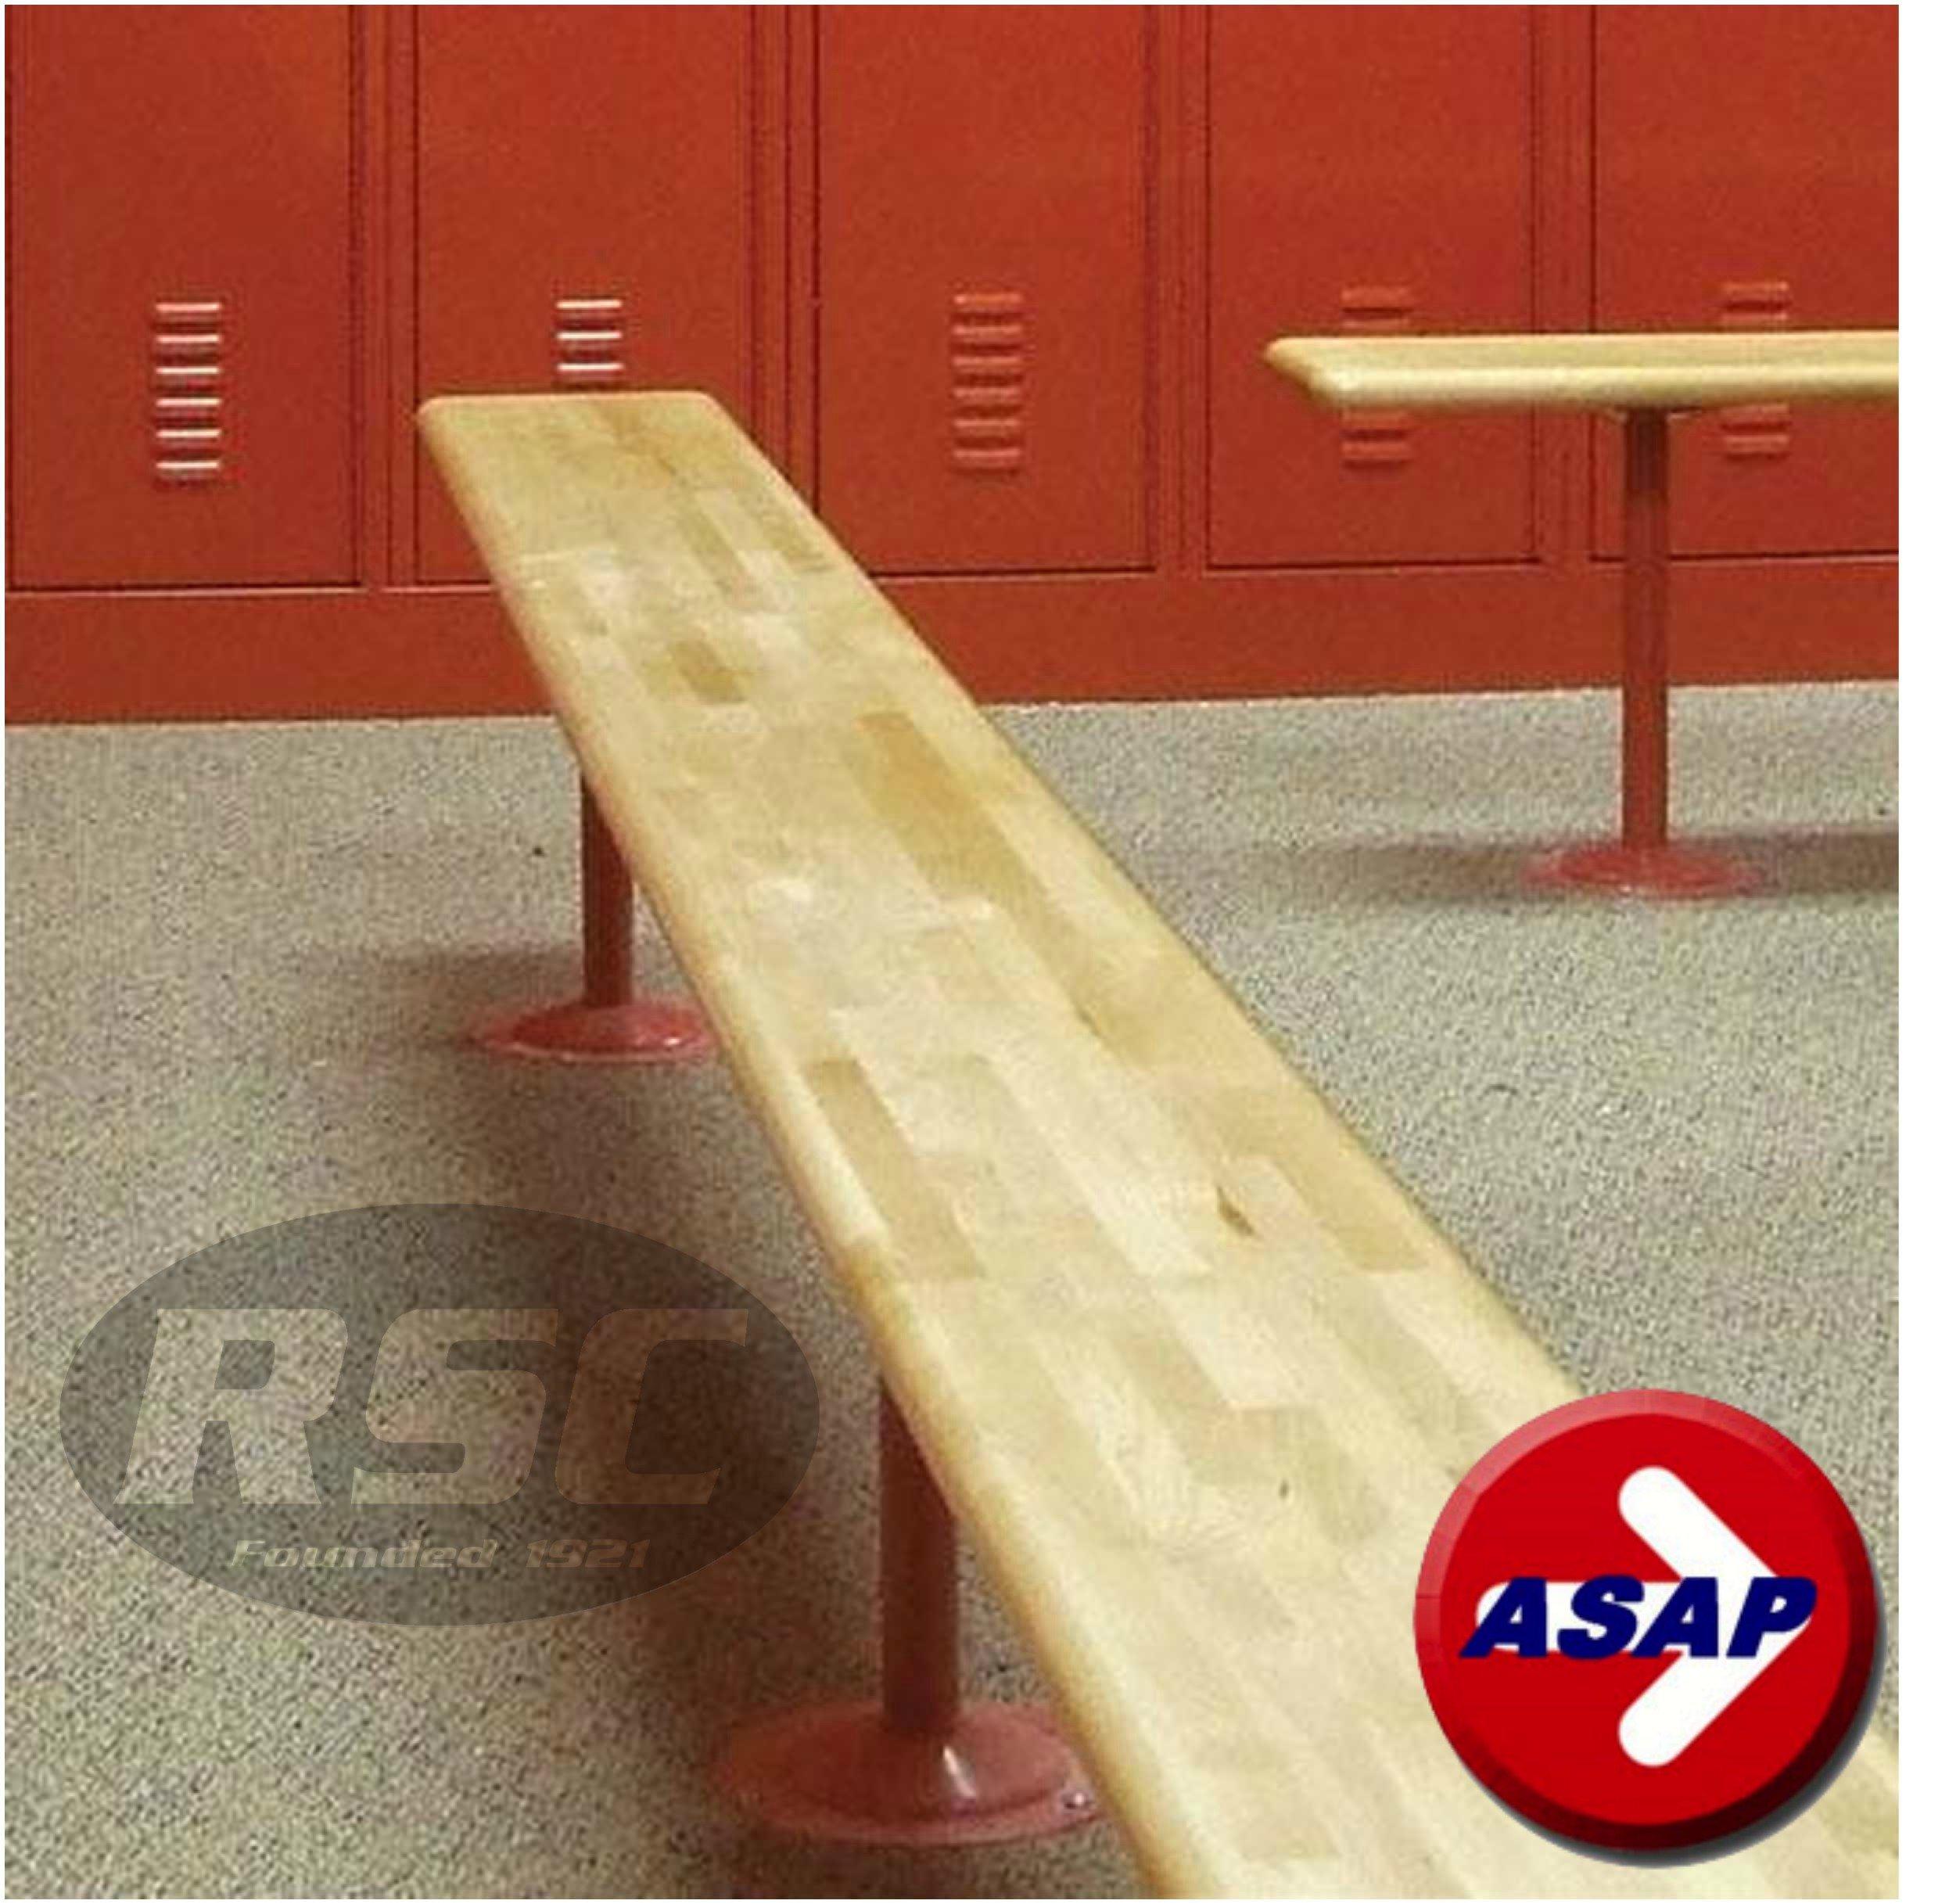 Hardwood Locker Room Bench Top (No Pedestals, Top Only) - 36'' L x 9.5'' W, 1.25'' Thick